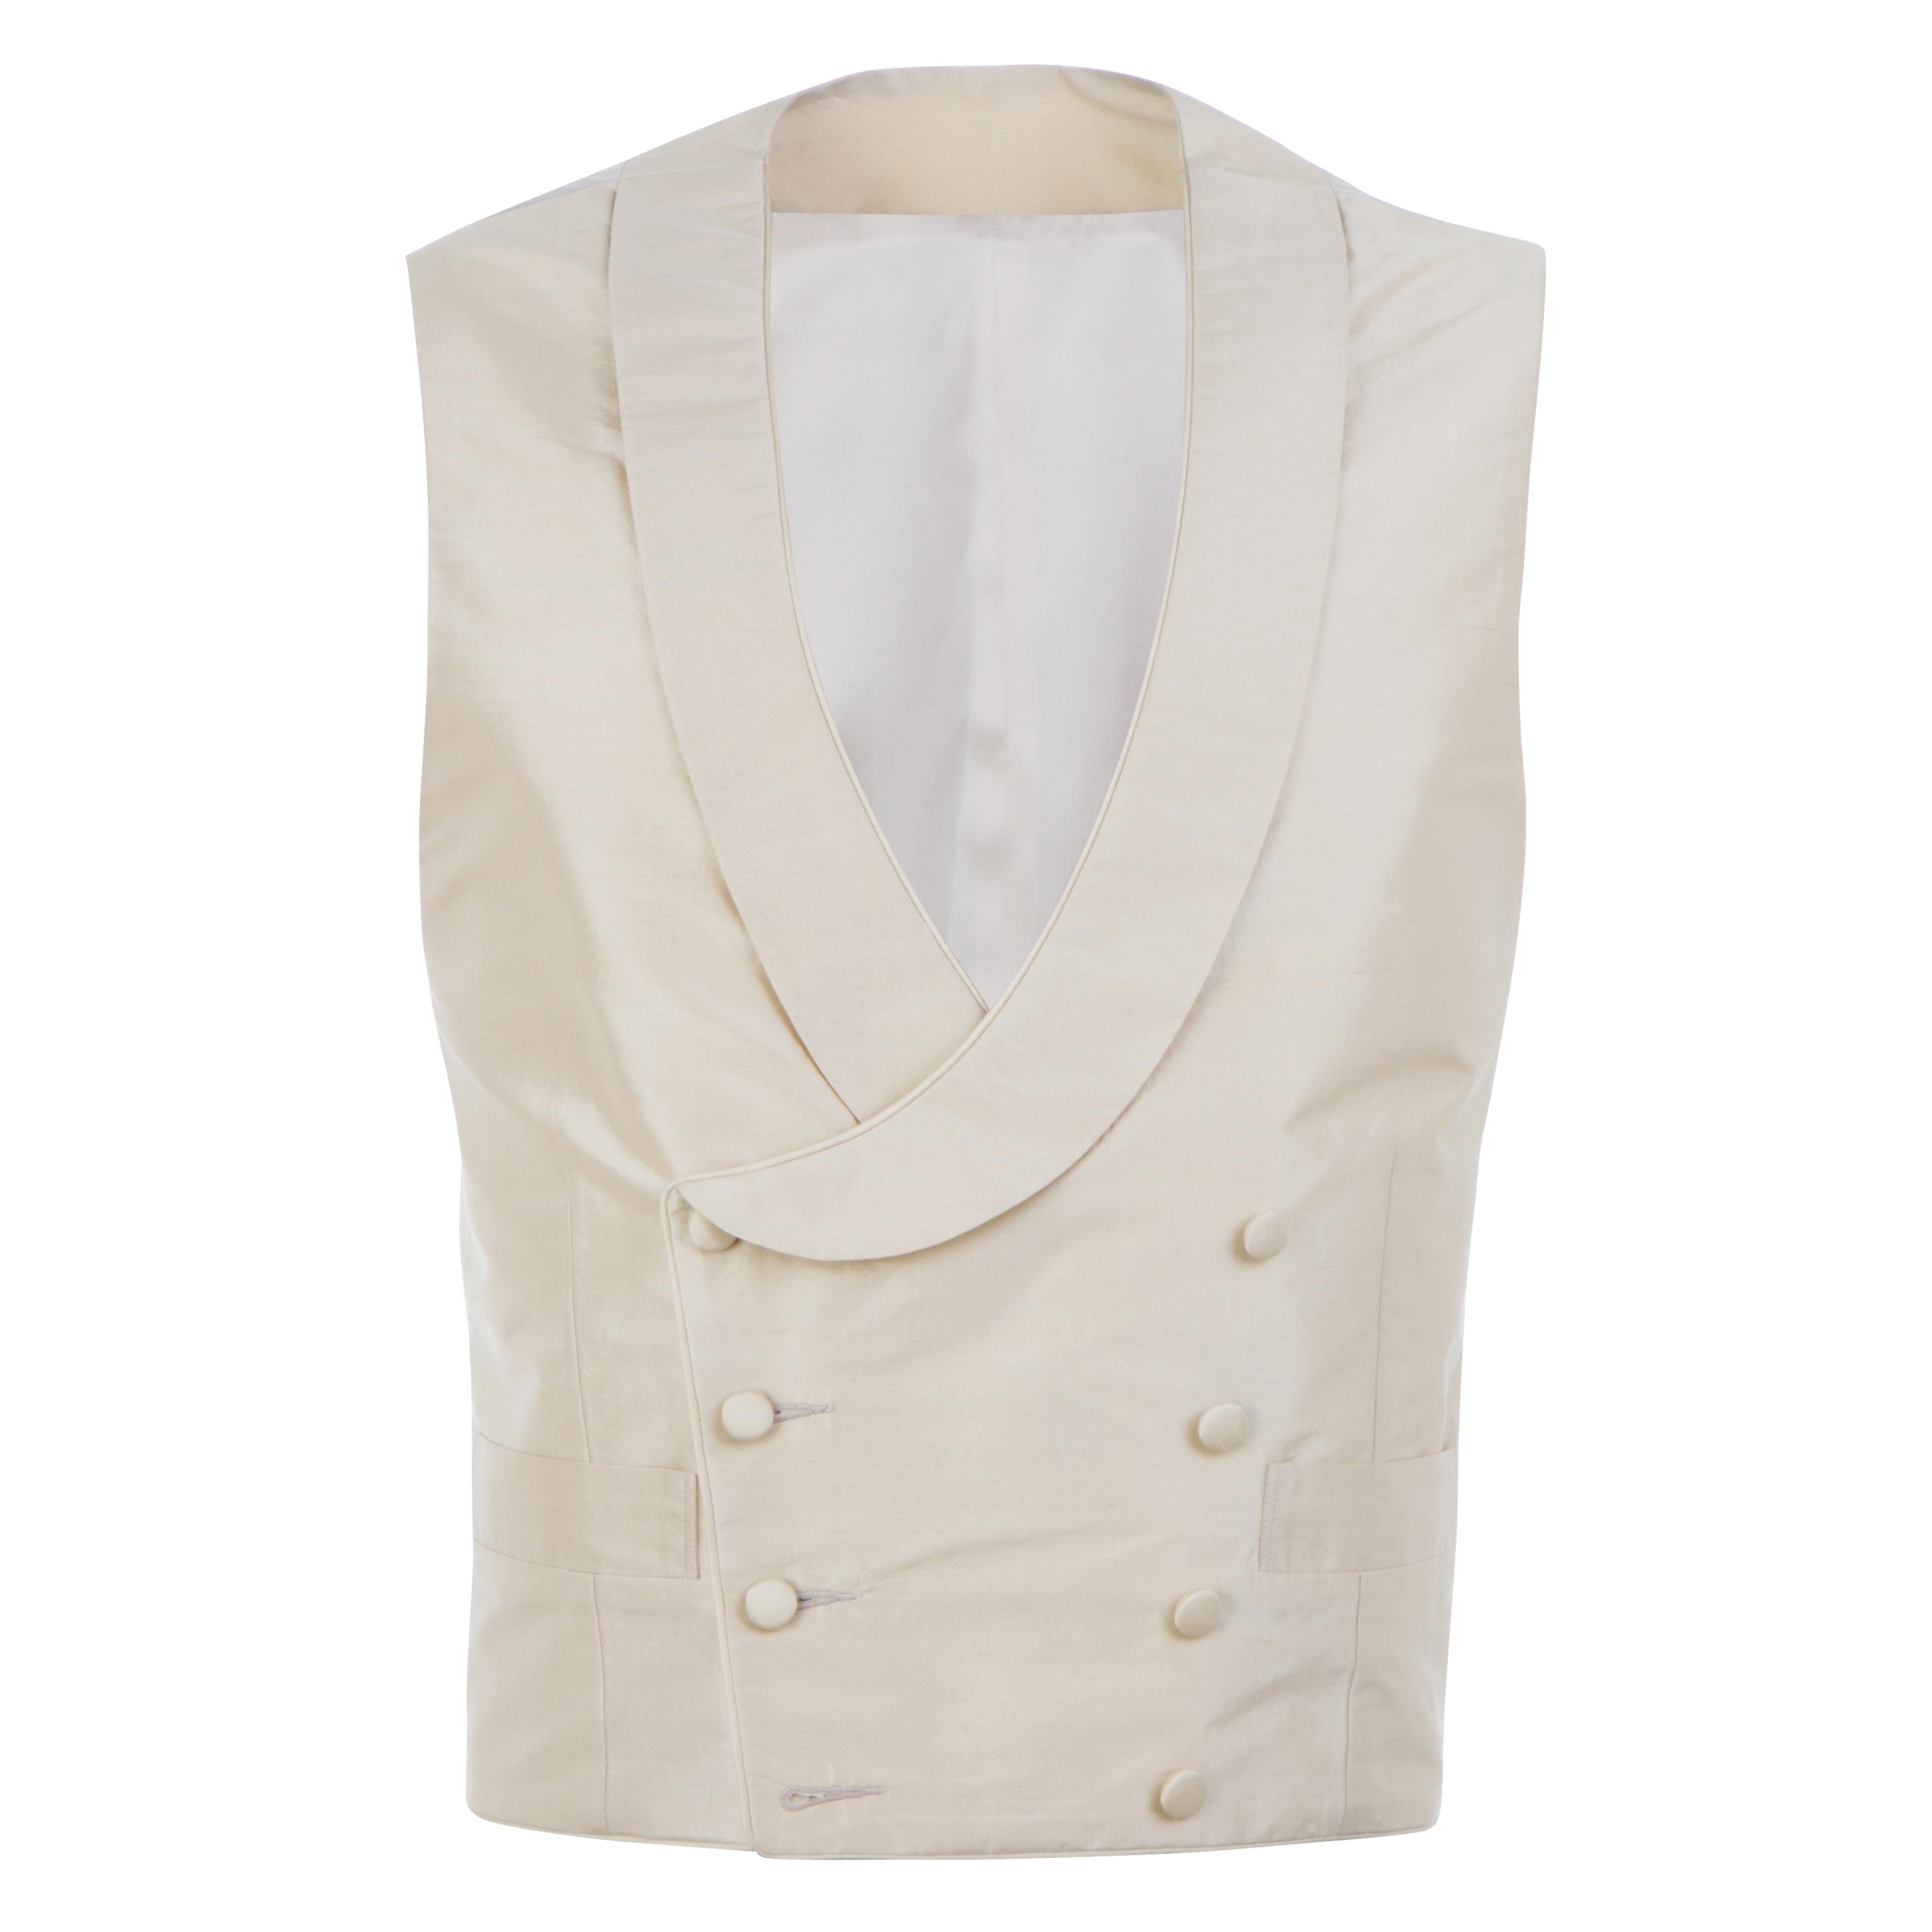 Reversible Formal Waistcoats